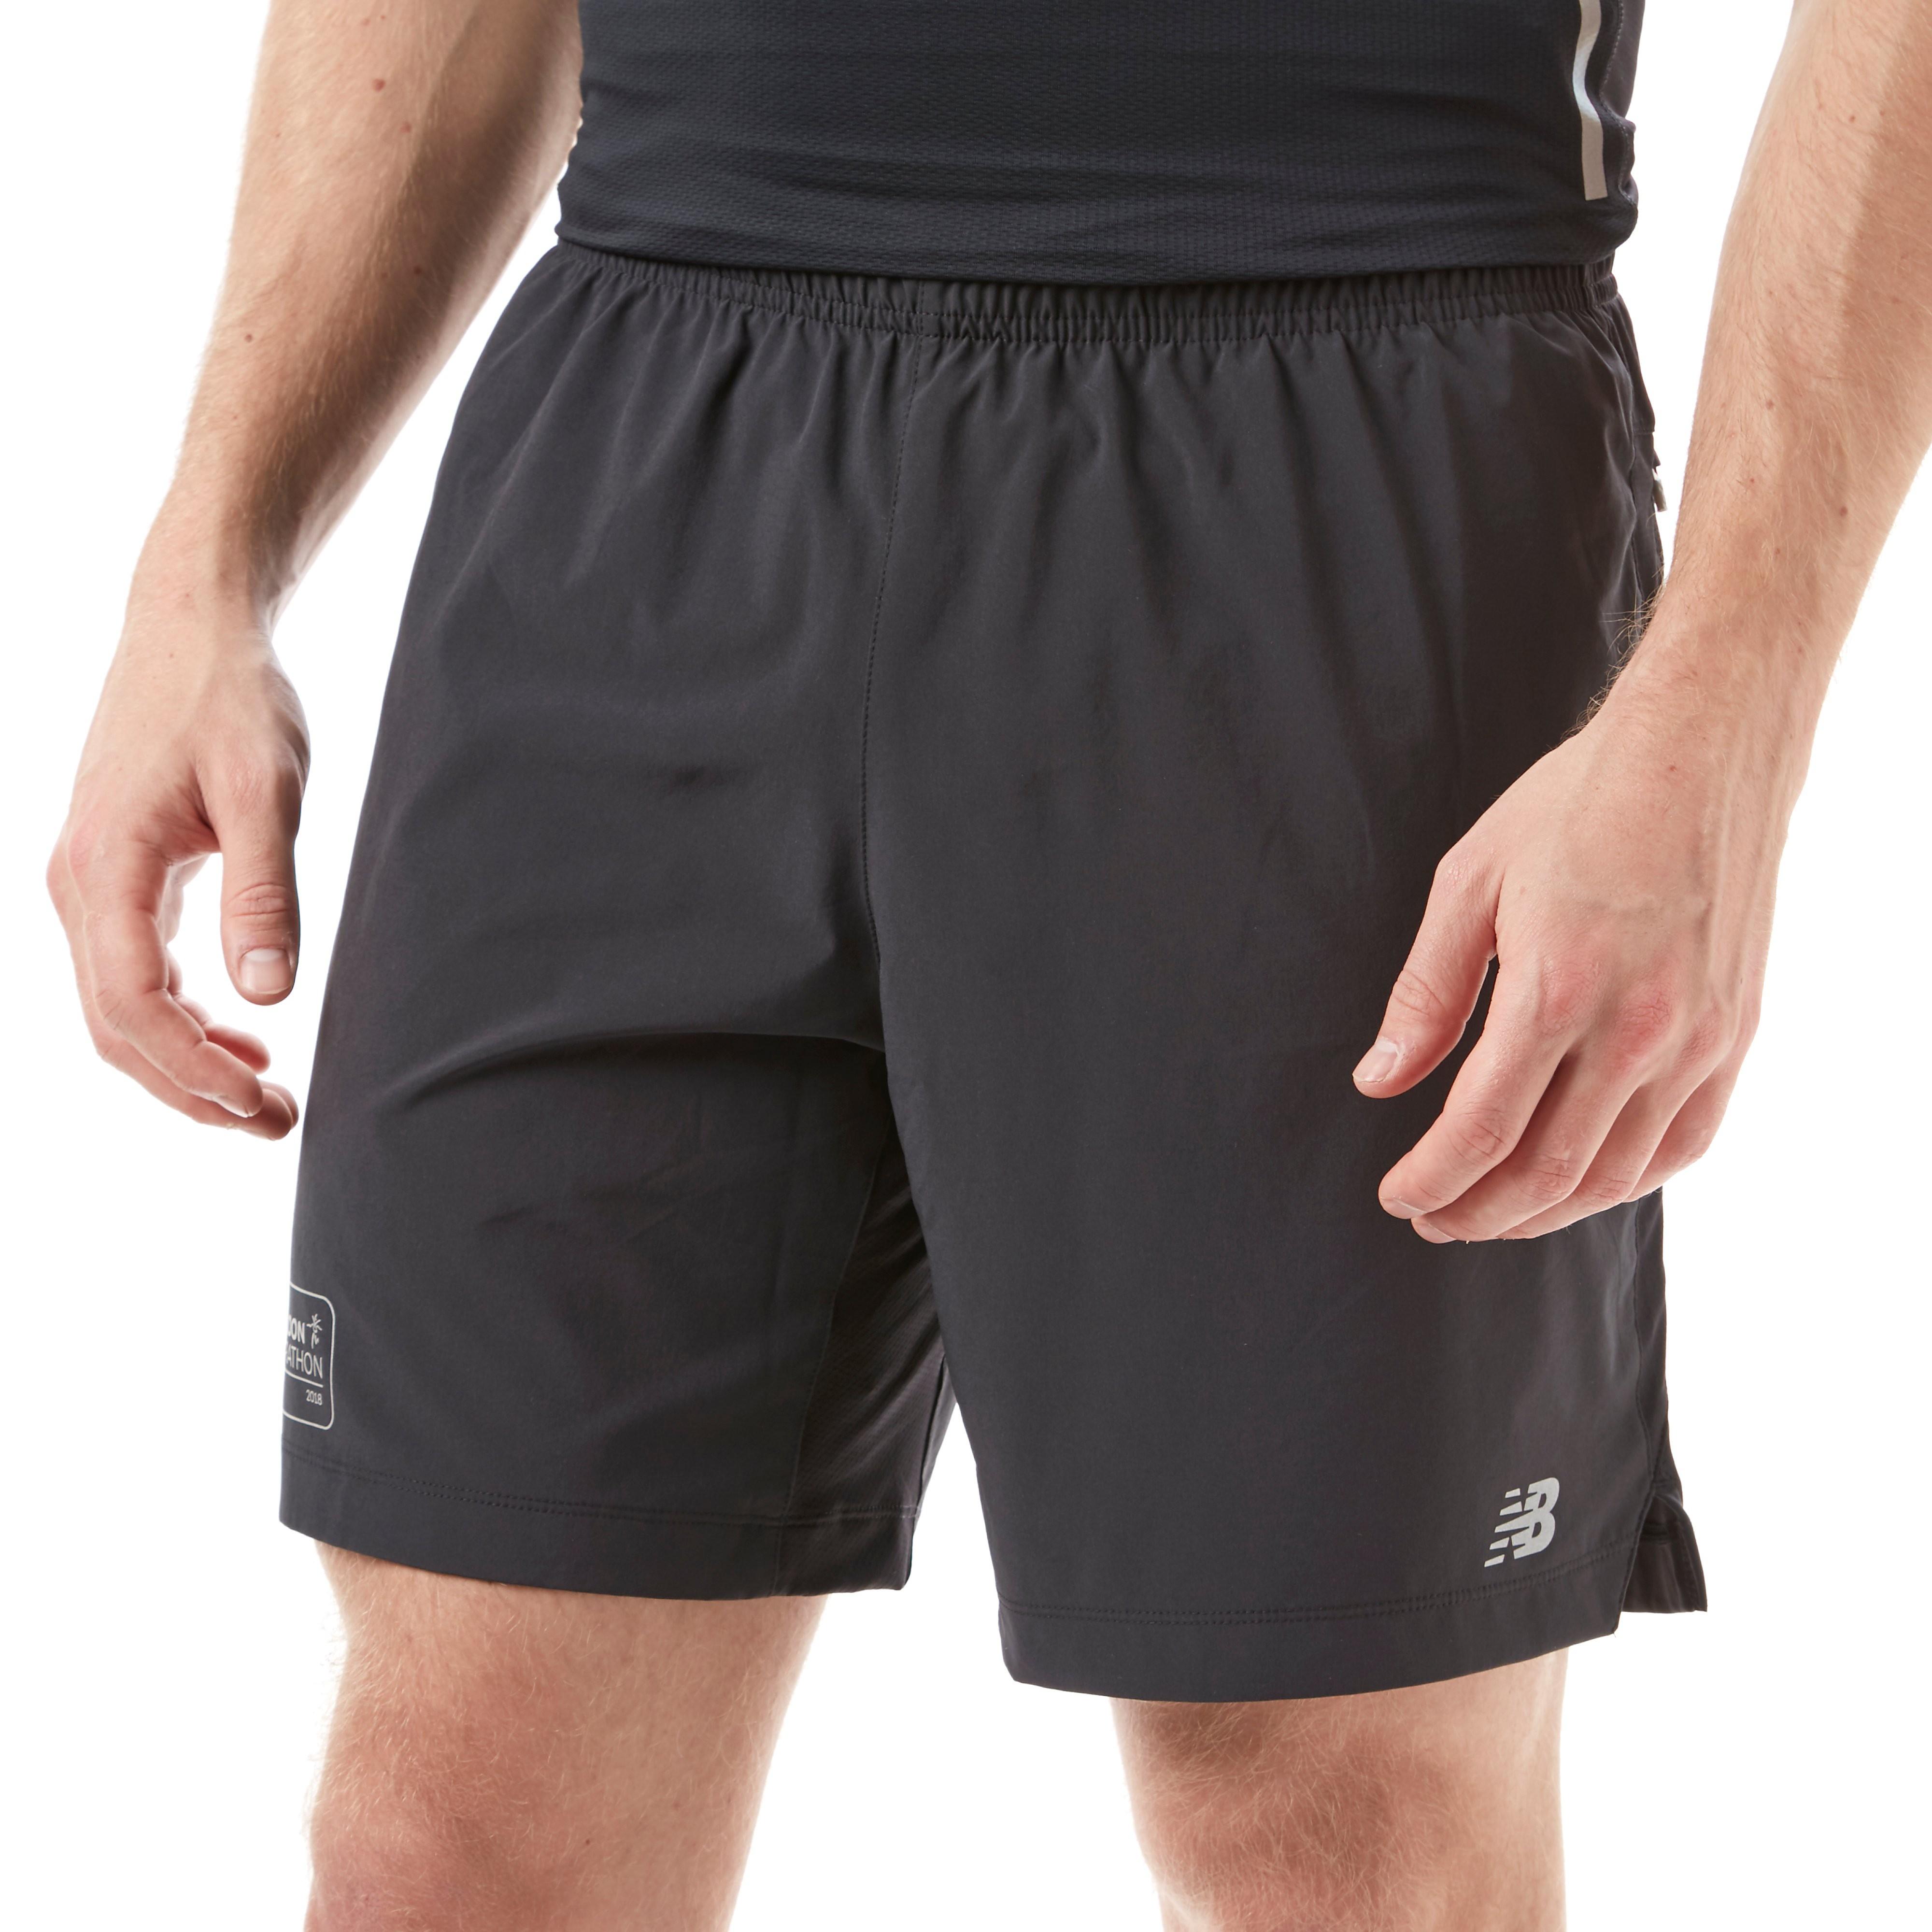 "New Balance London Marathon Edition Impact 7"" Men's Running Shorts"